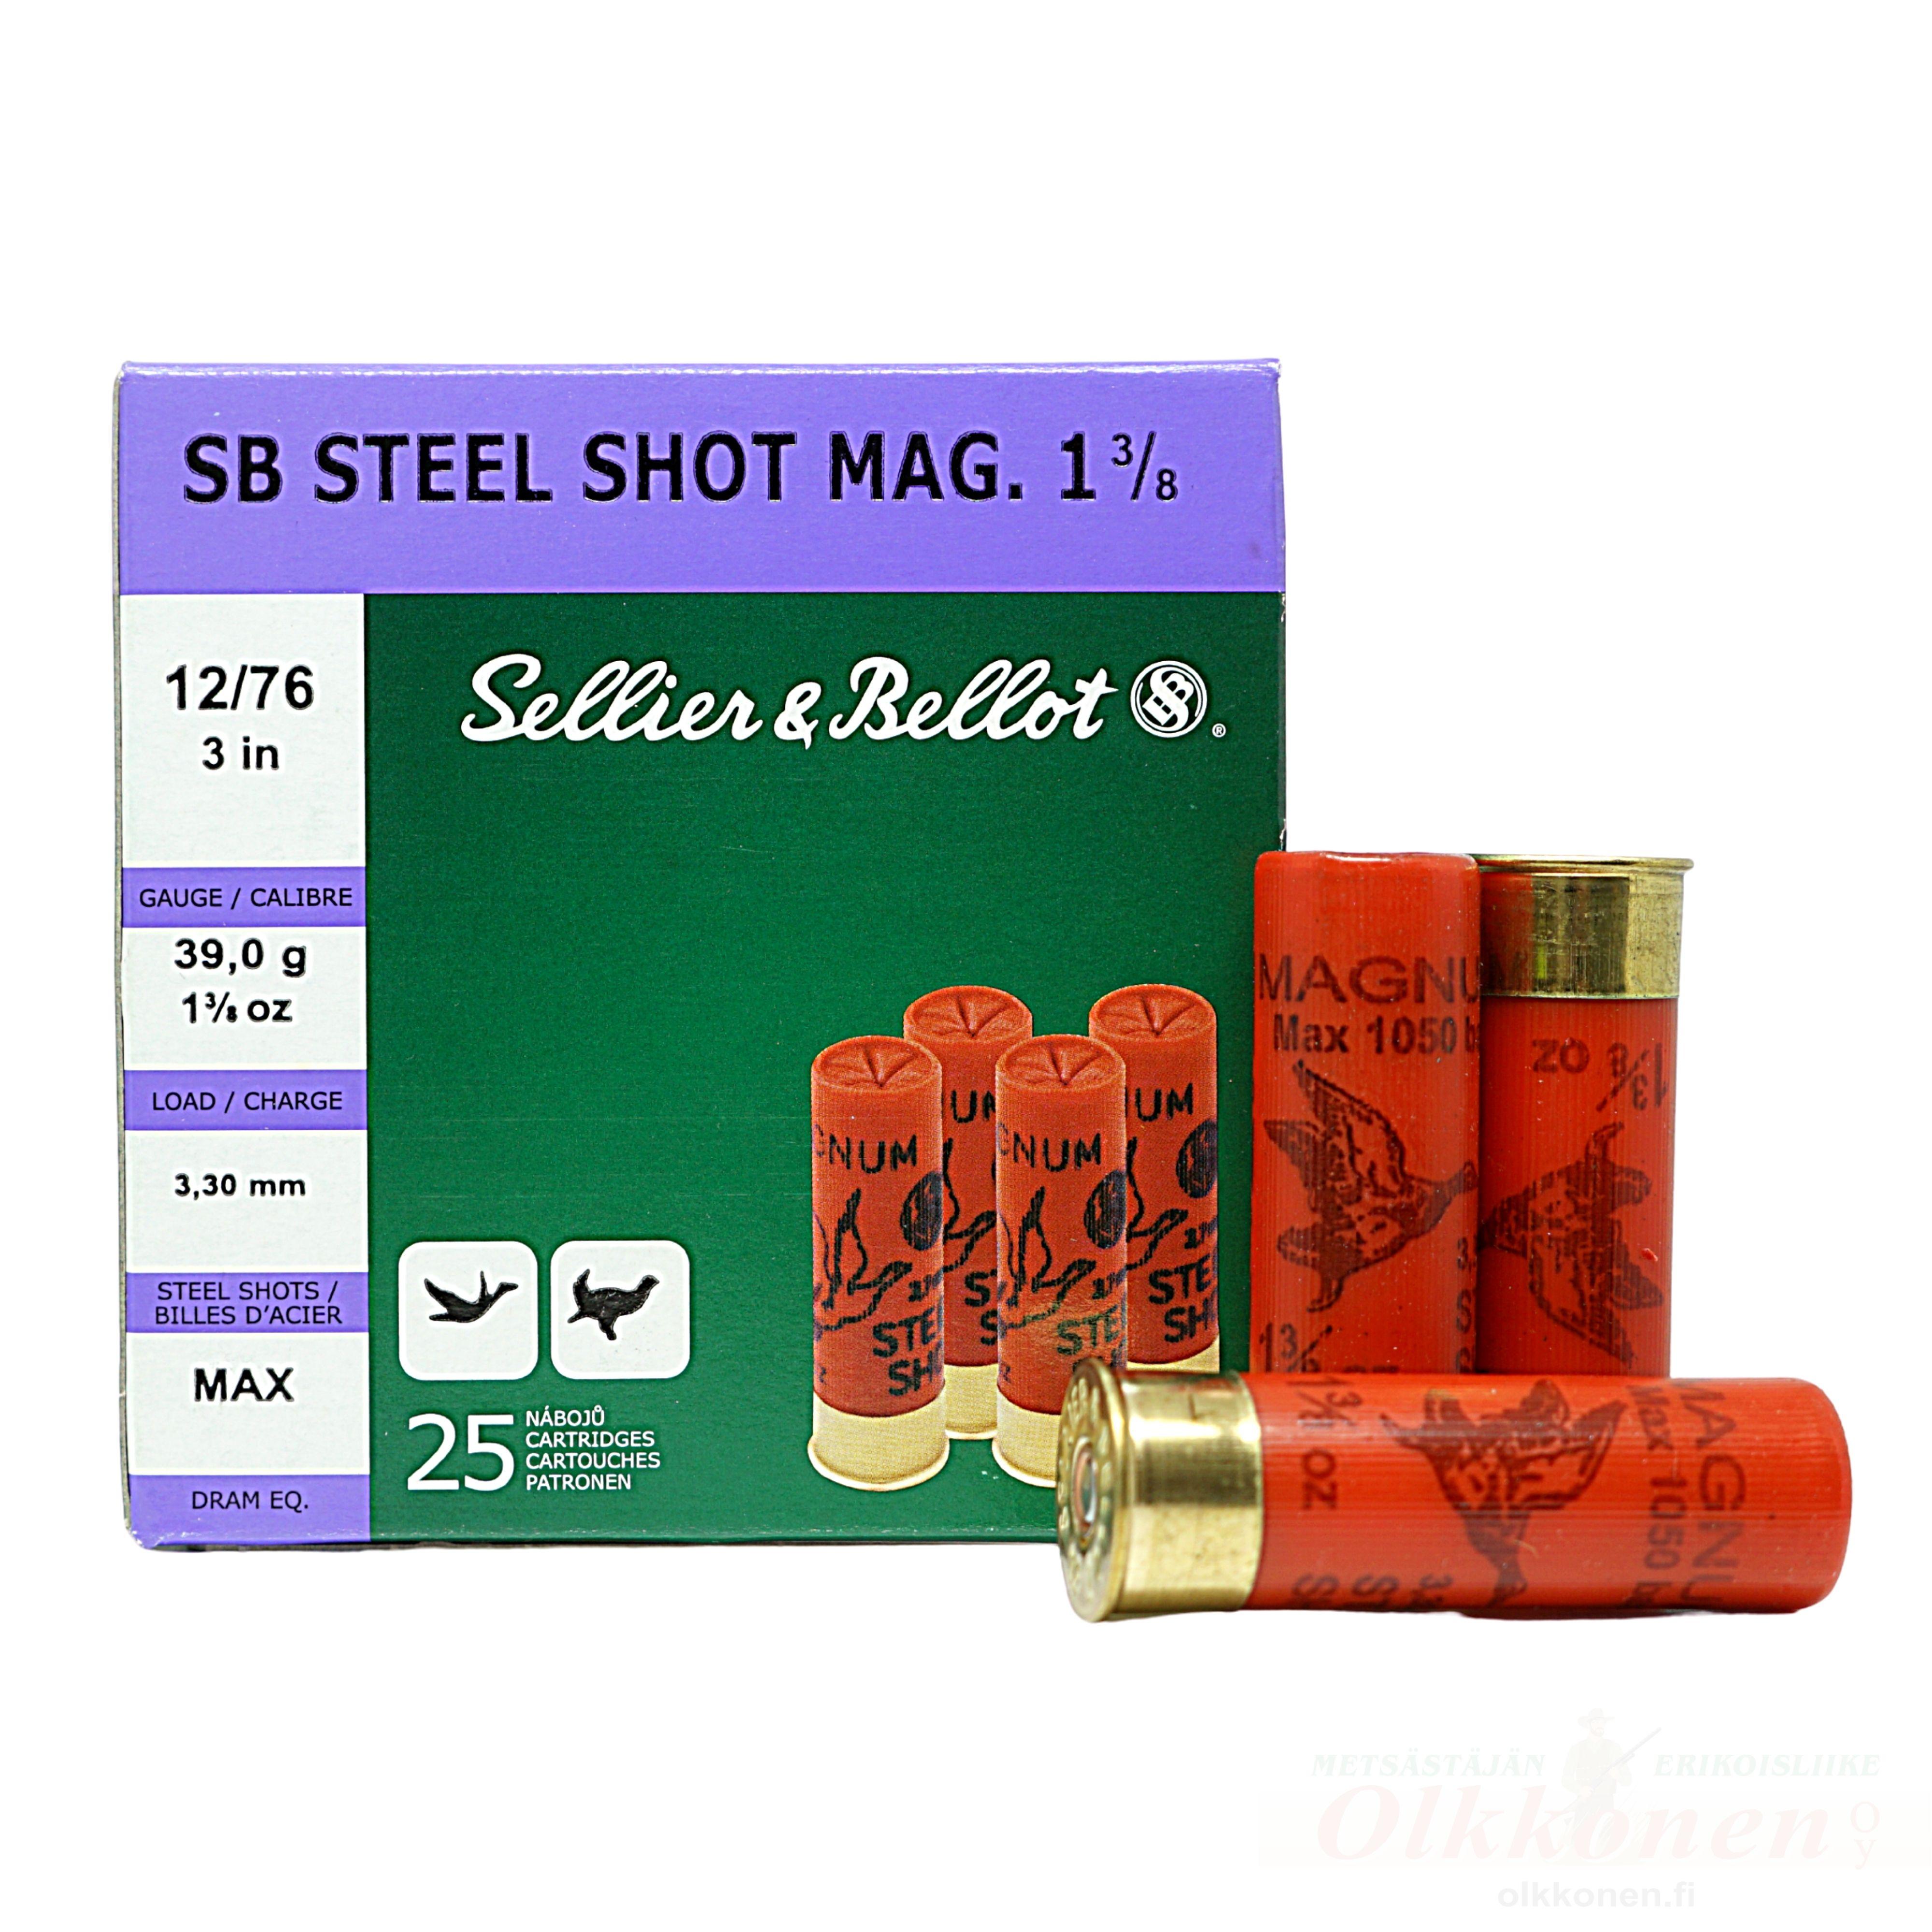 Sellier & Bellot 12/76 Steel Magnum 39,0g 3,3mm